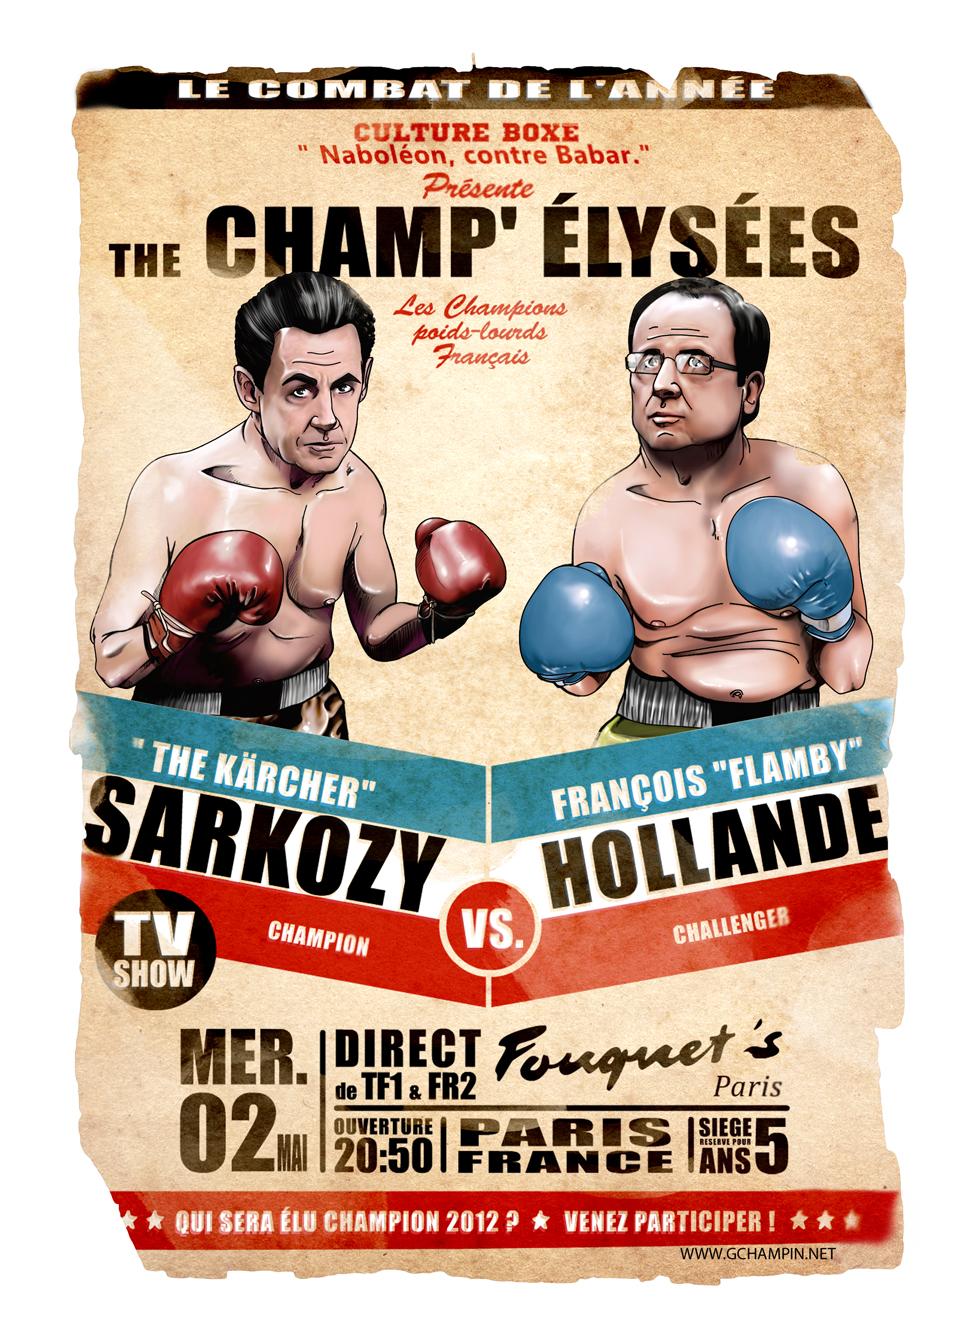 Cultureboxe Geoffrey Champin François Hollande Nicolas Sarkozy Présidentielles 2012 Politique Boxe